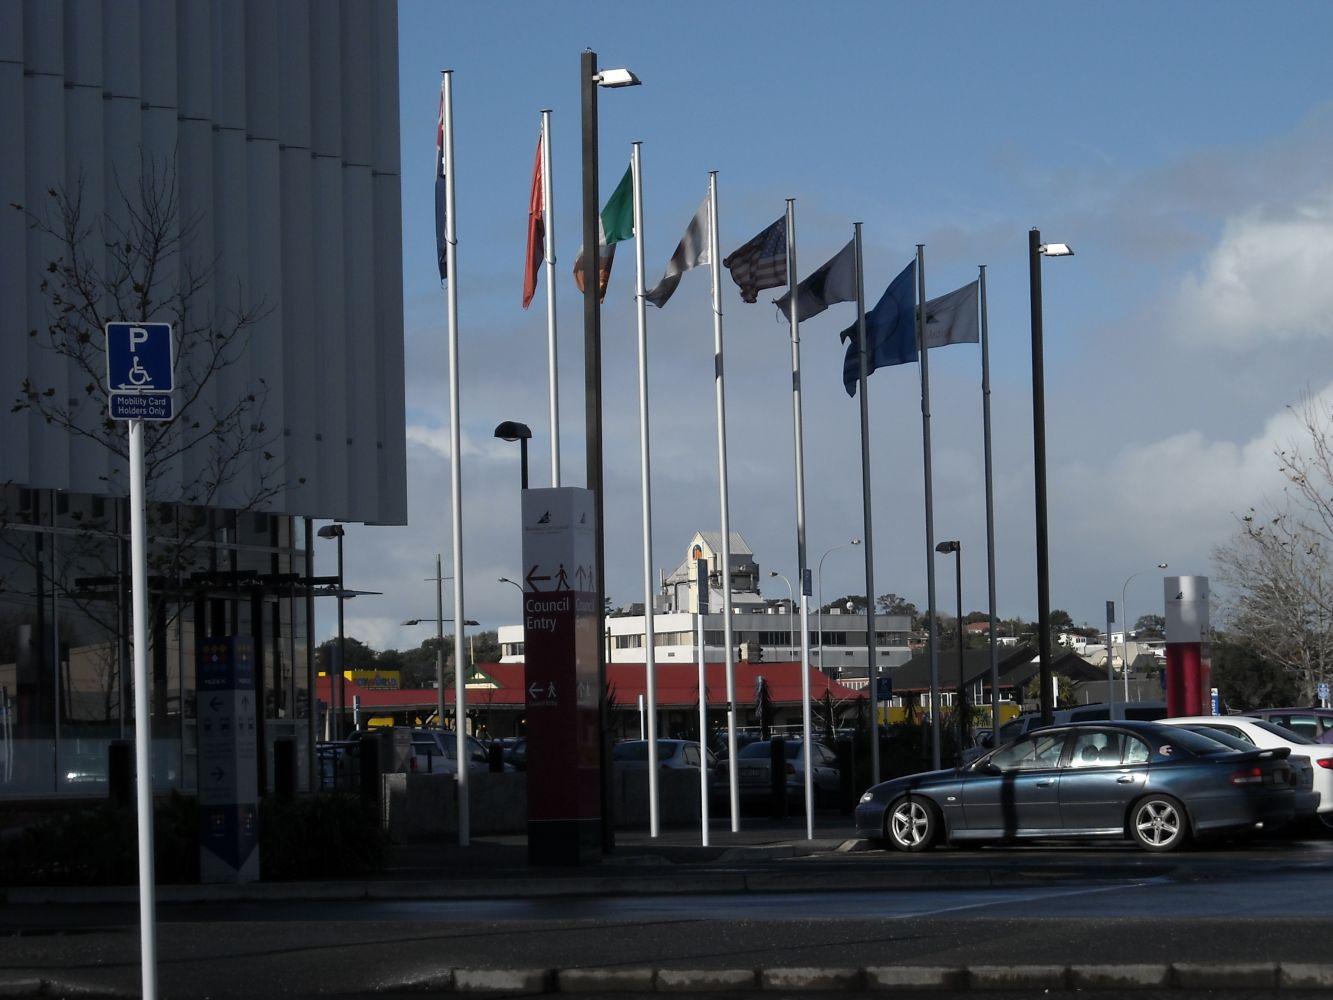 8m flagpoles